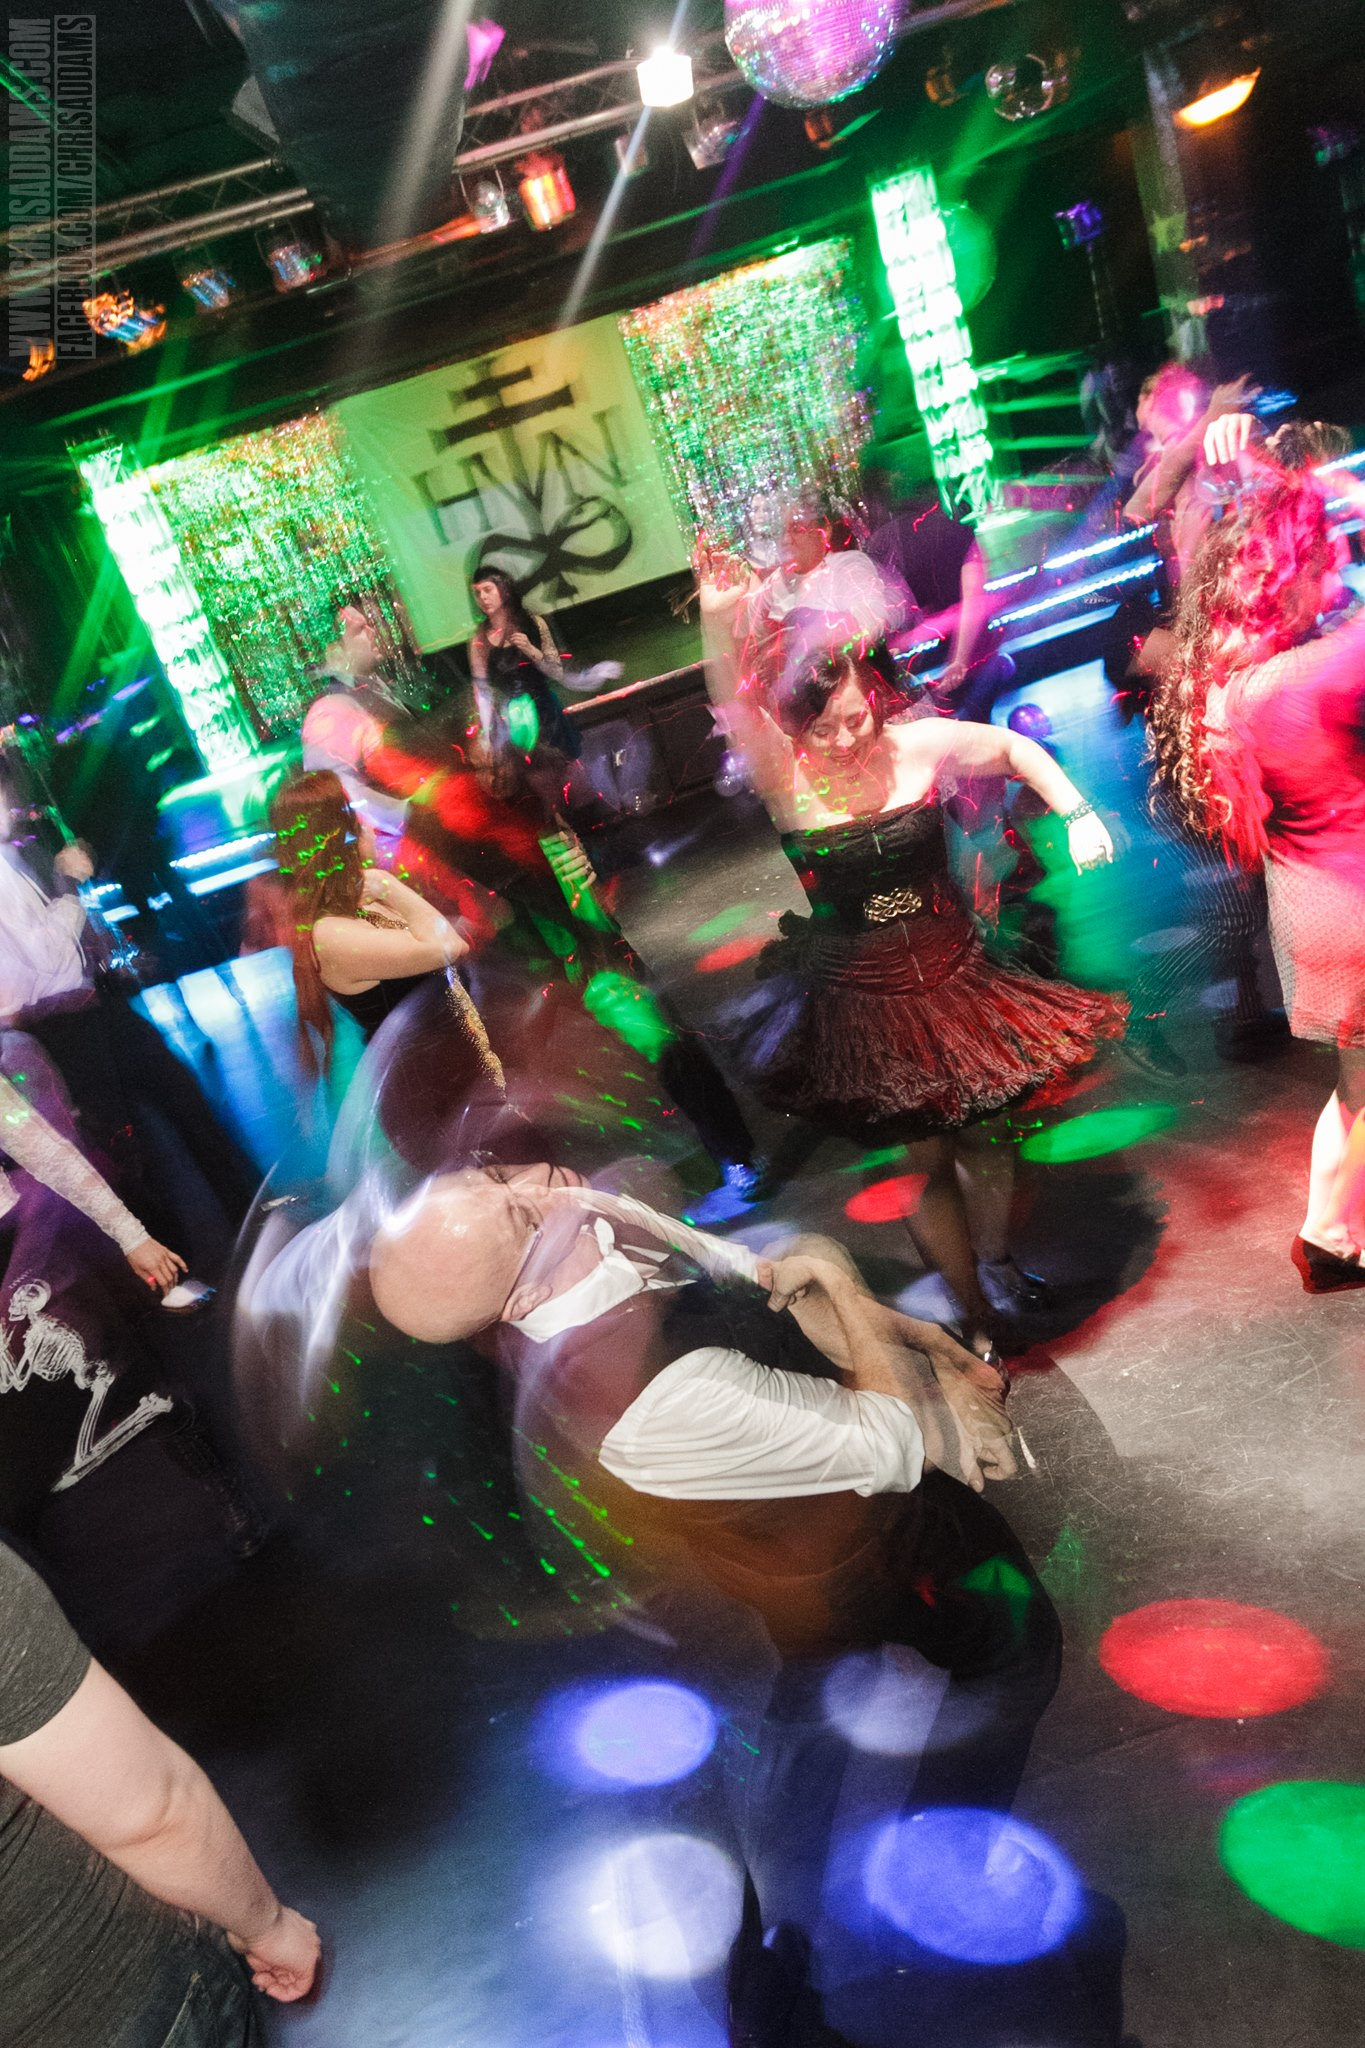 TheHavenClub-Goth-Industrial-Dance-Alternative-Northampton-MA (4).jpg